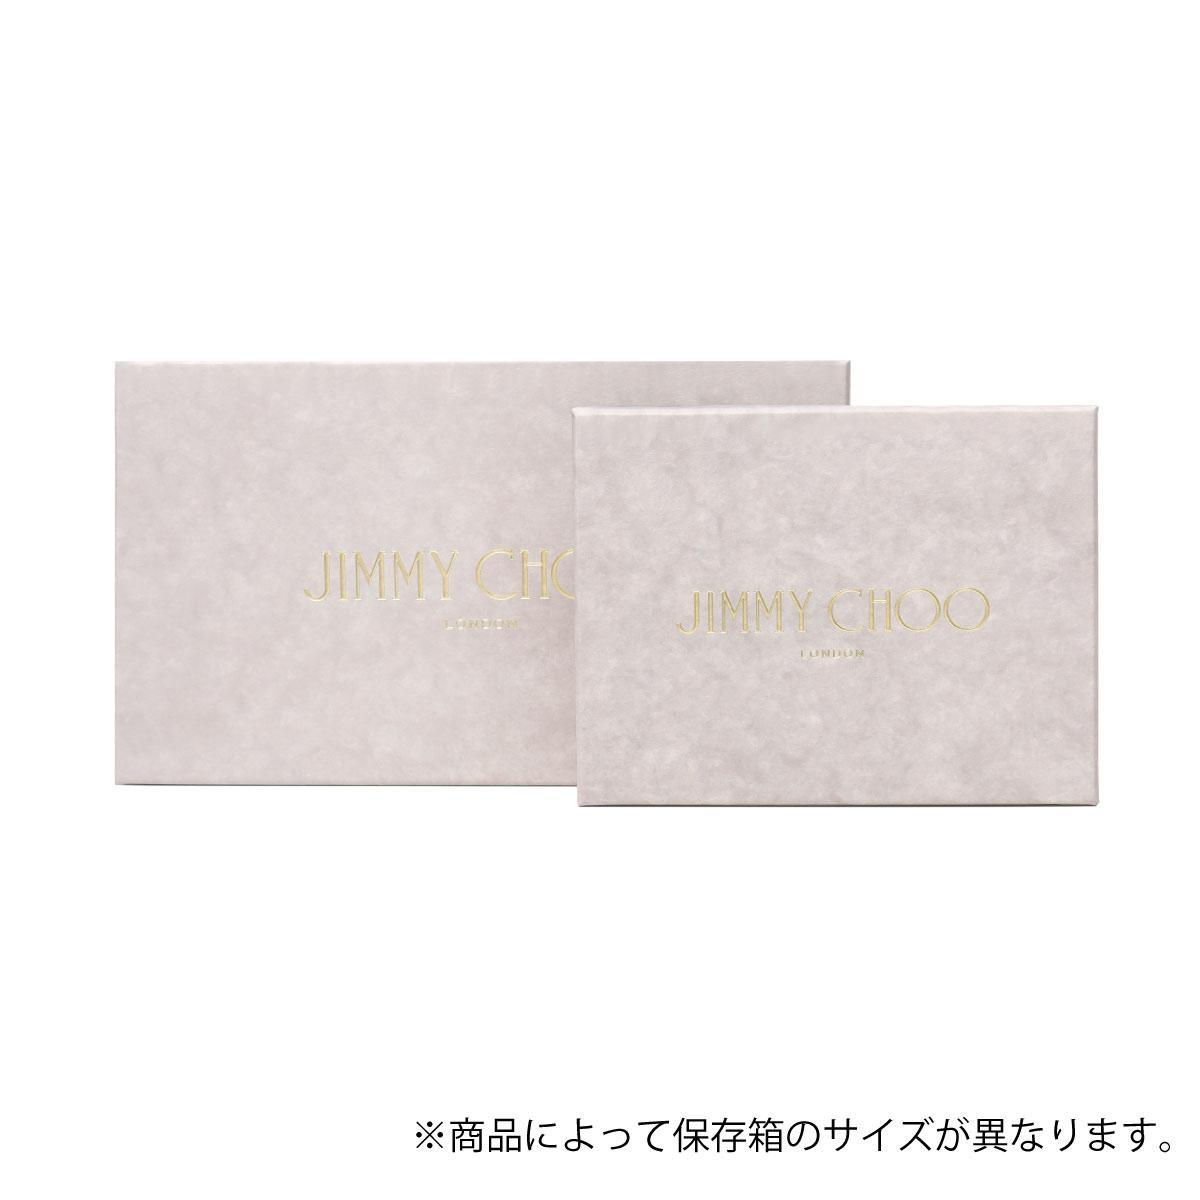 JIMMY CHOO ジミー チュウ   カードケース   LISE リセ